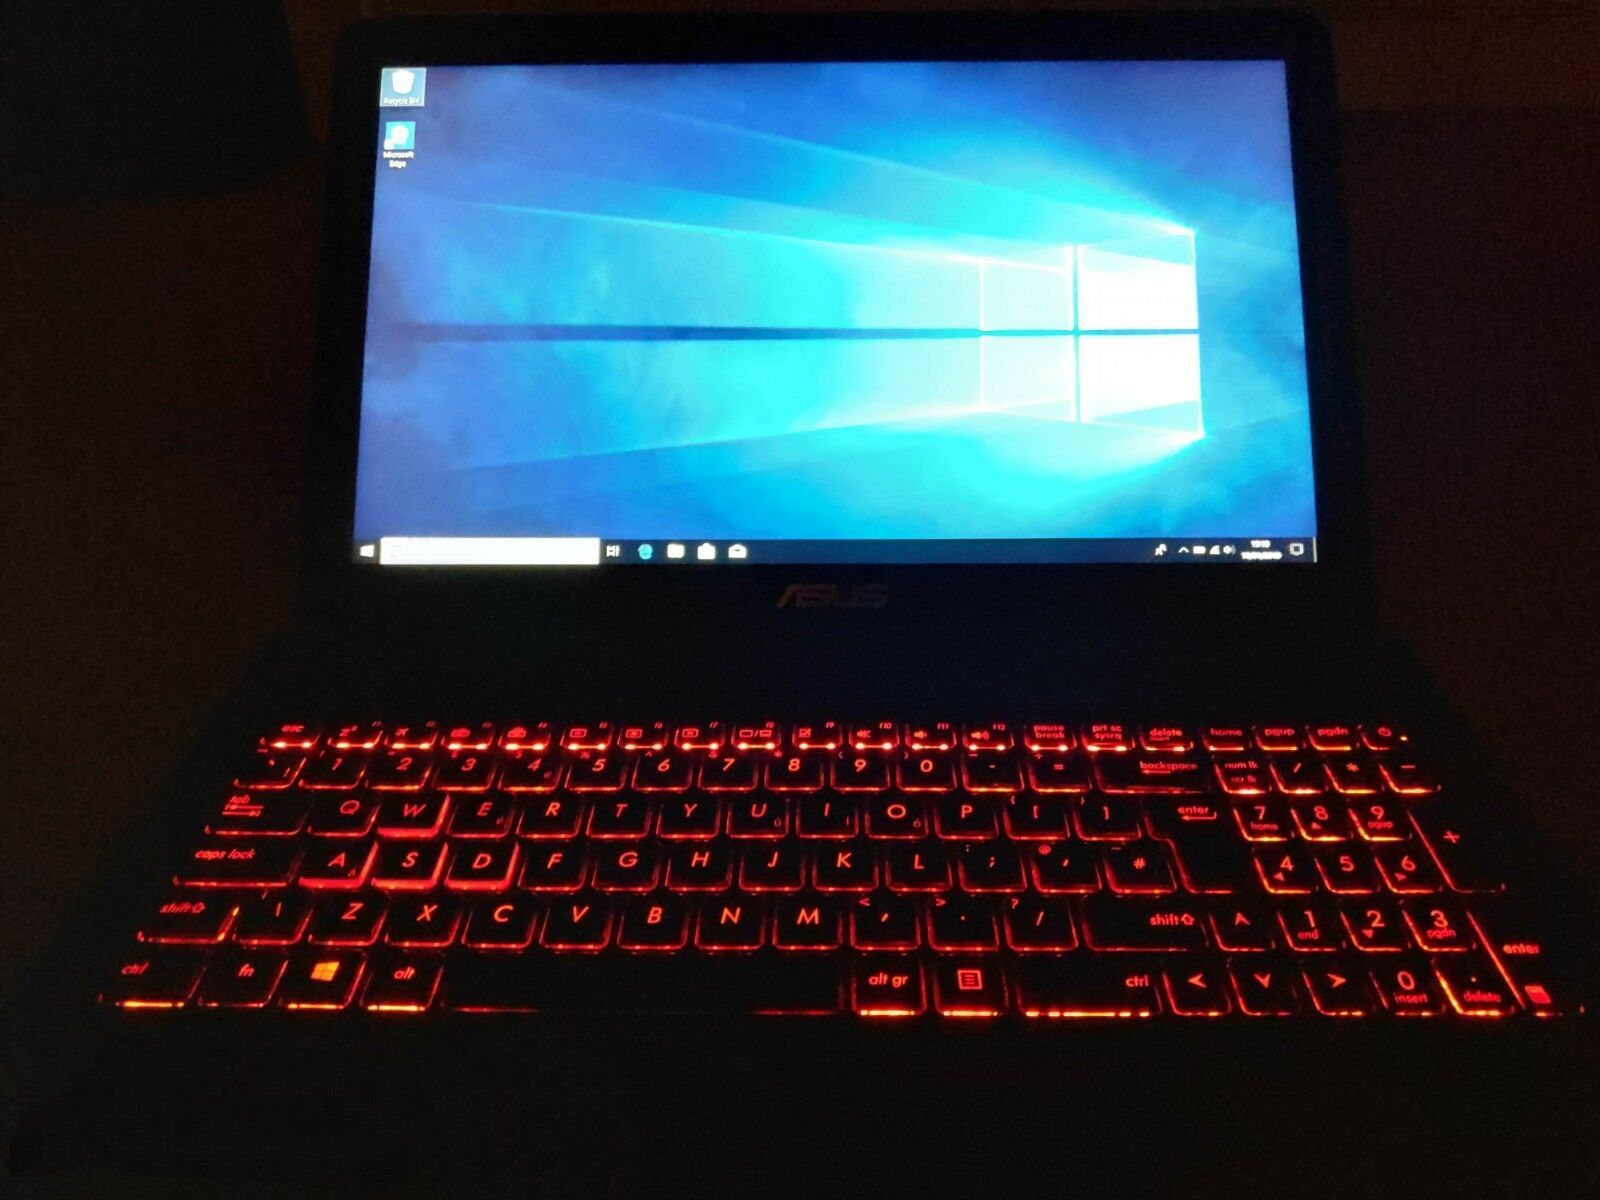 Asus Rog G551jw Gaming Laptop I7 4720hq 3 6ghz Gtx 960m 8gb Ram